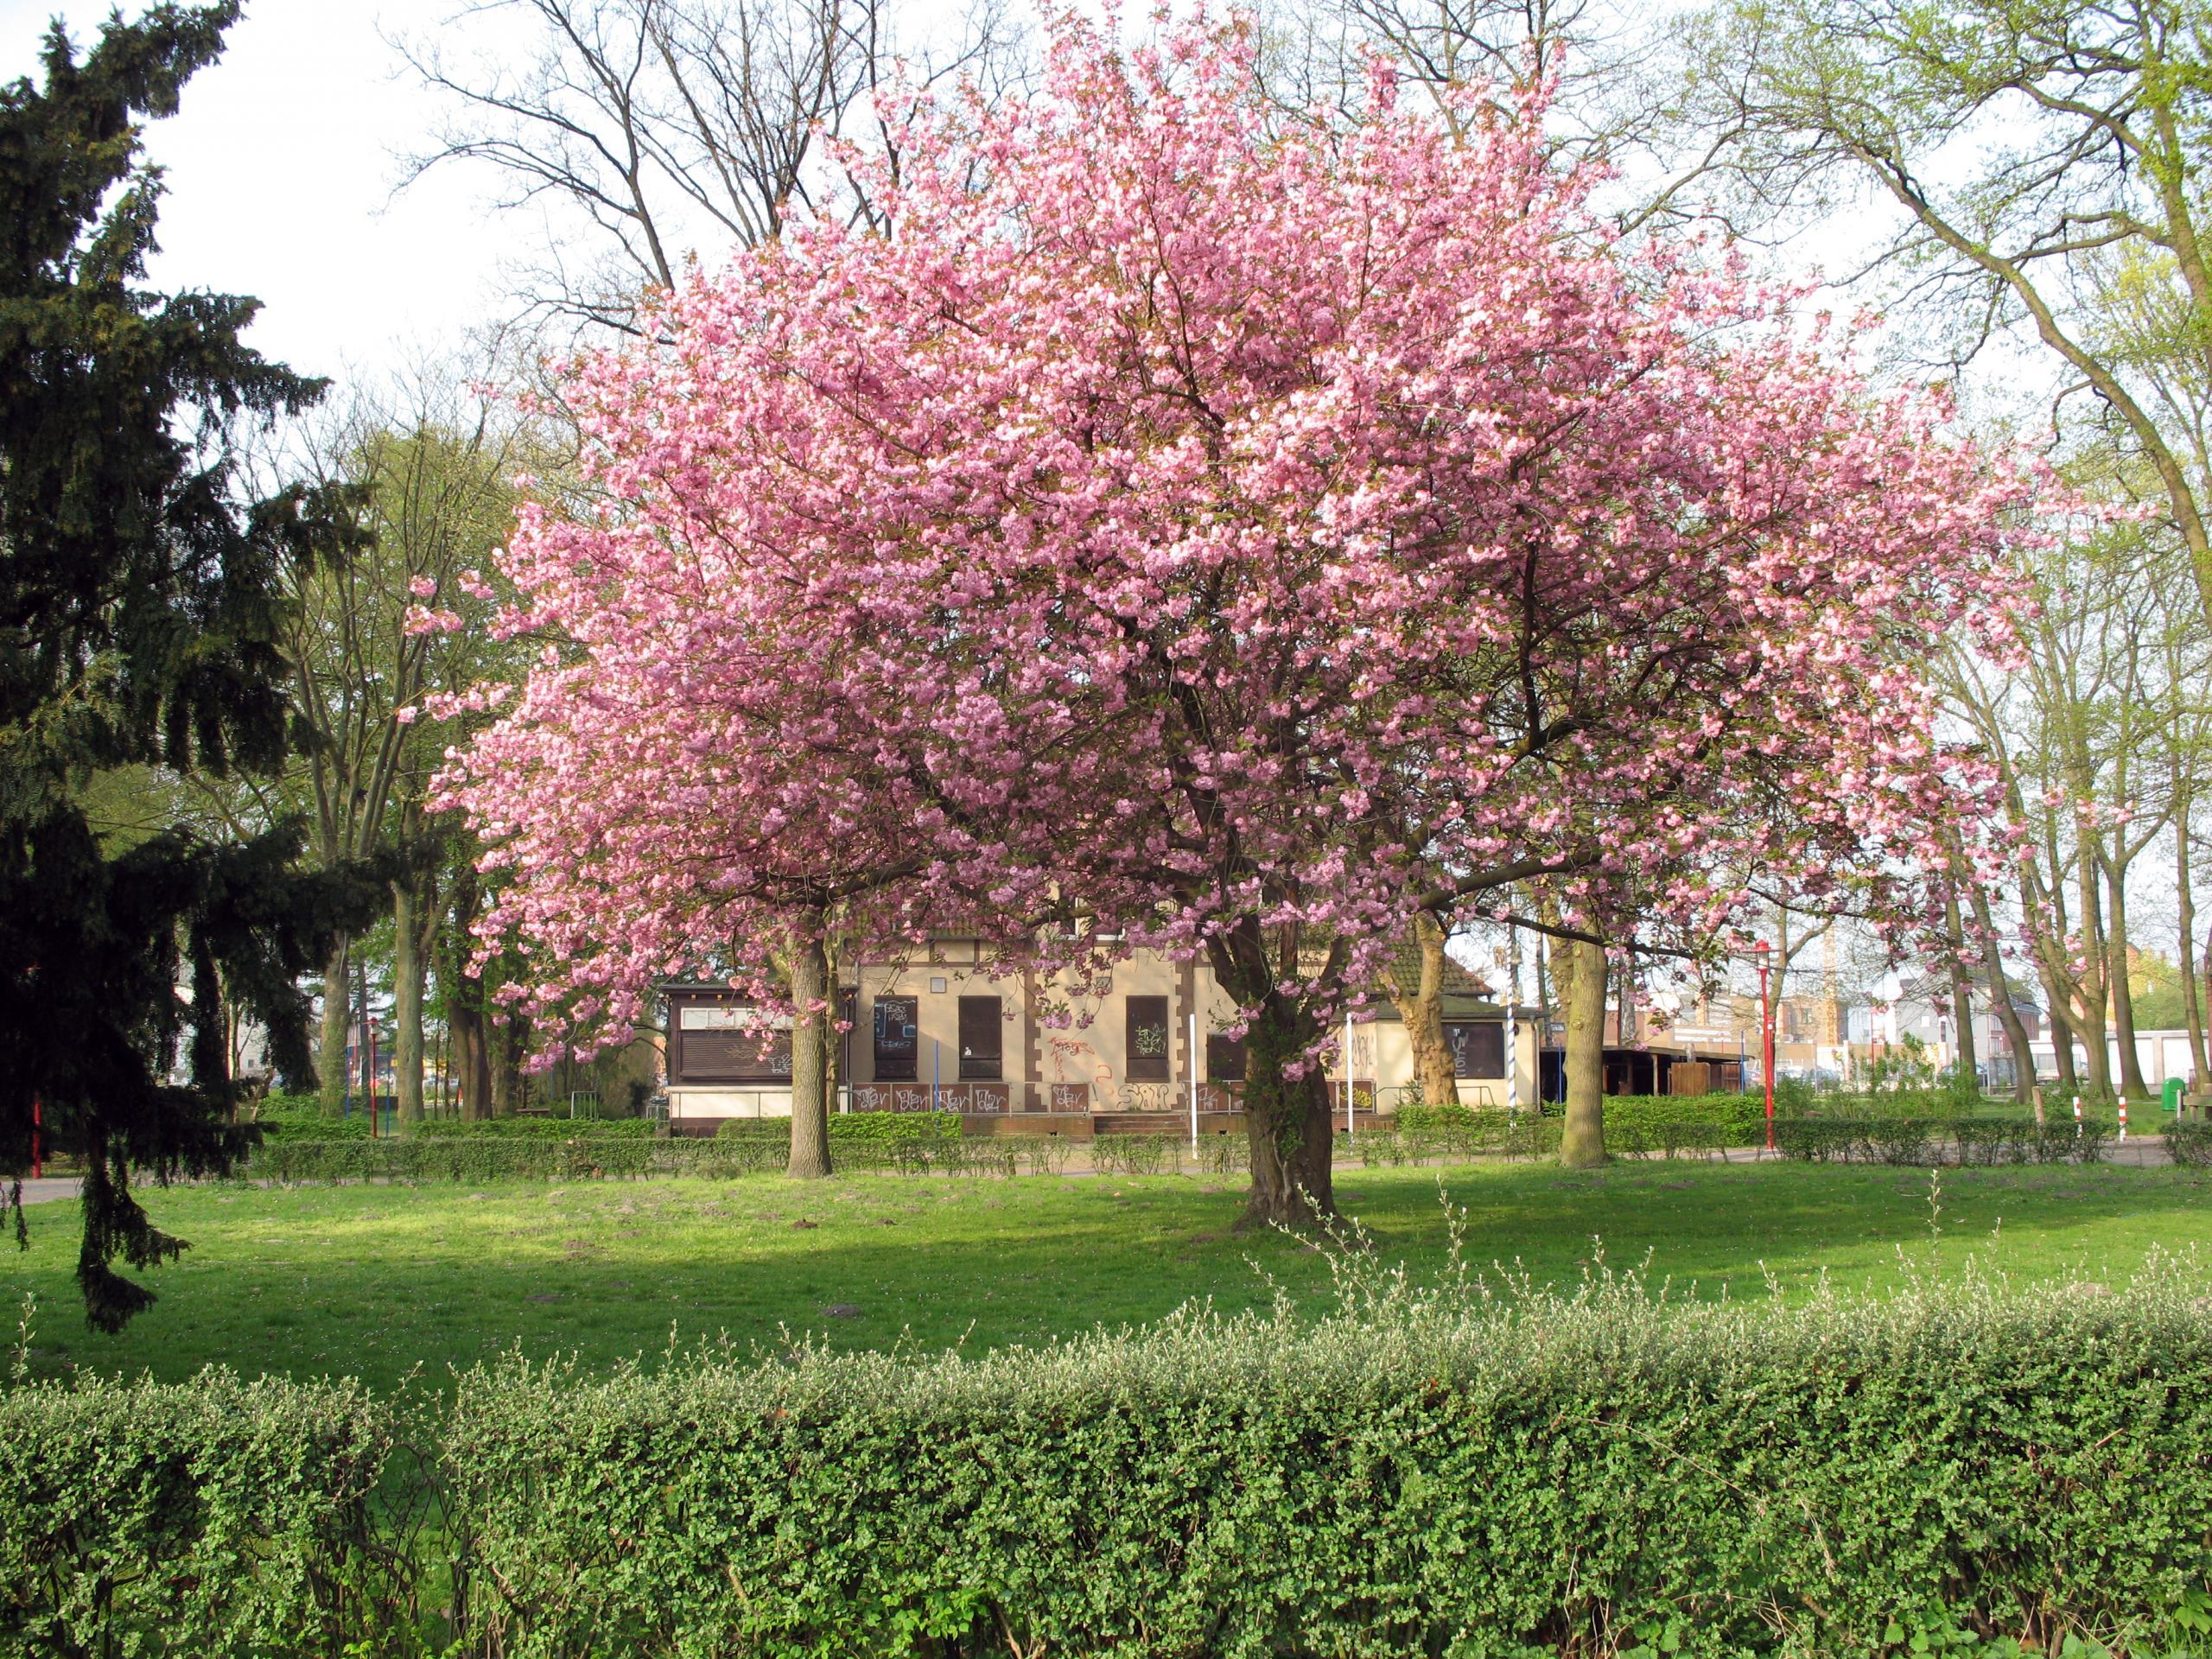 2007.04.17. Alter Stadtpark 002 ©Stadt Lehrte